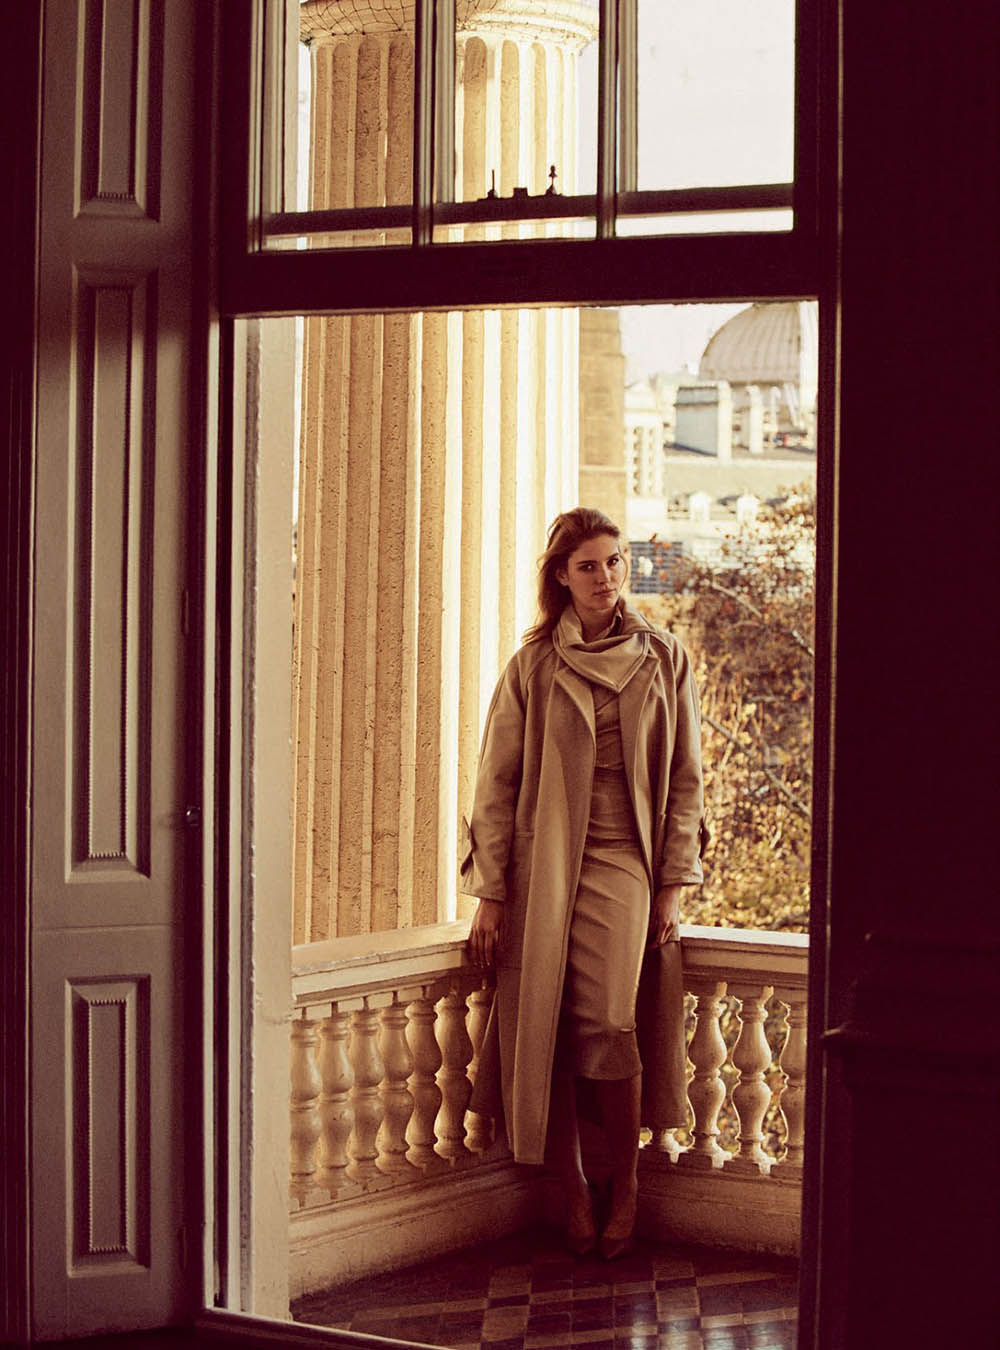 Alisa-Ahmann-by-Regan-Cameron-for-Harper's-Bazaar-UK-March-2019-12.jpg